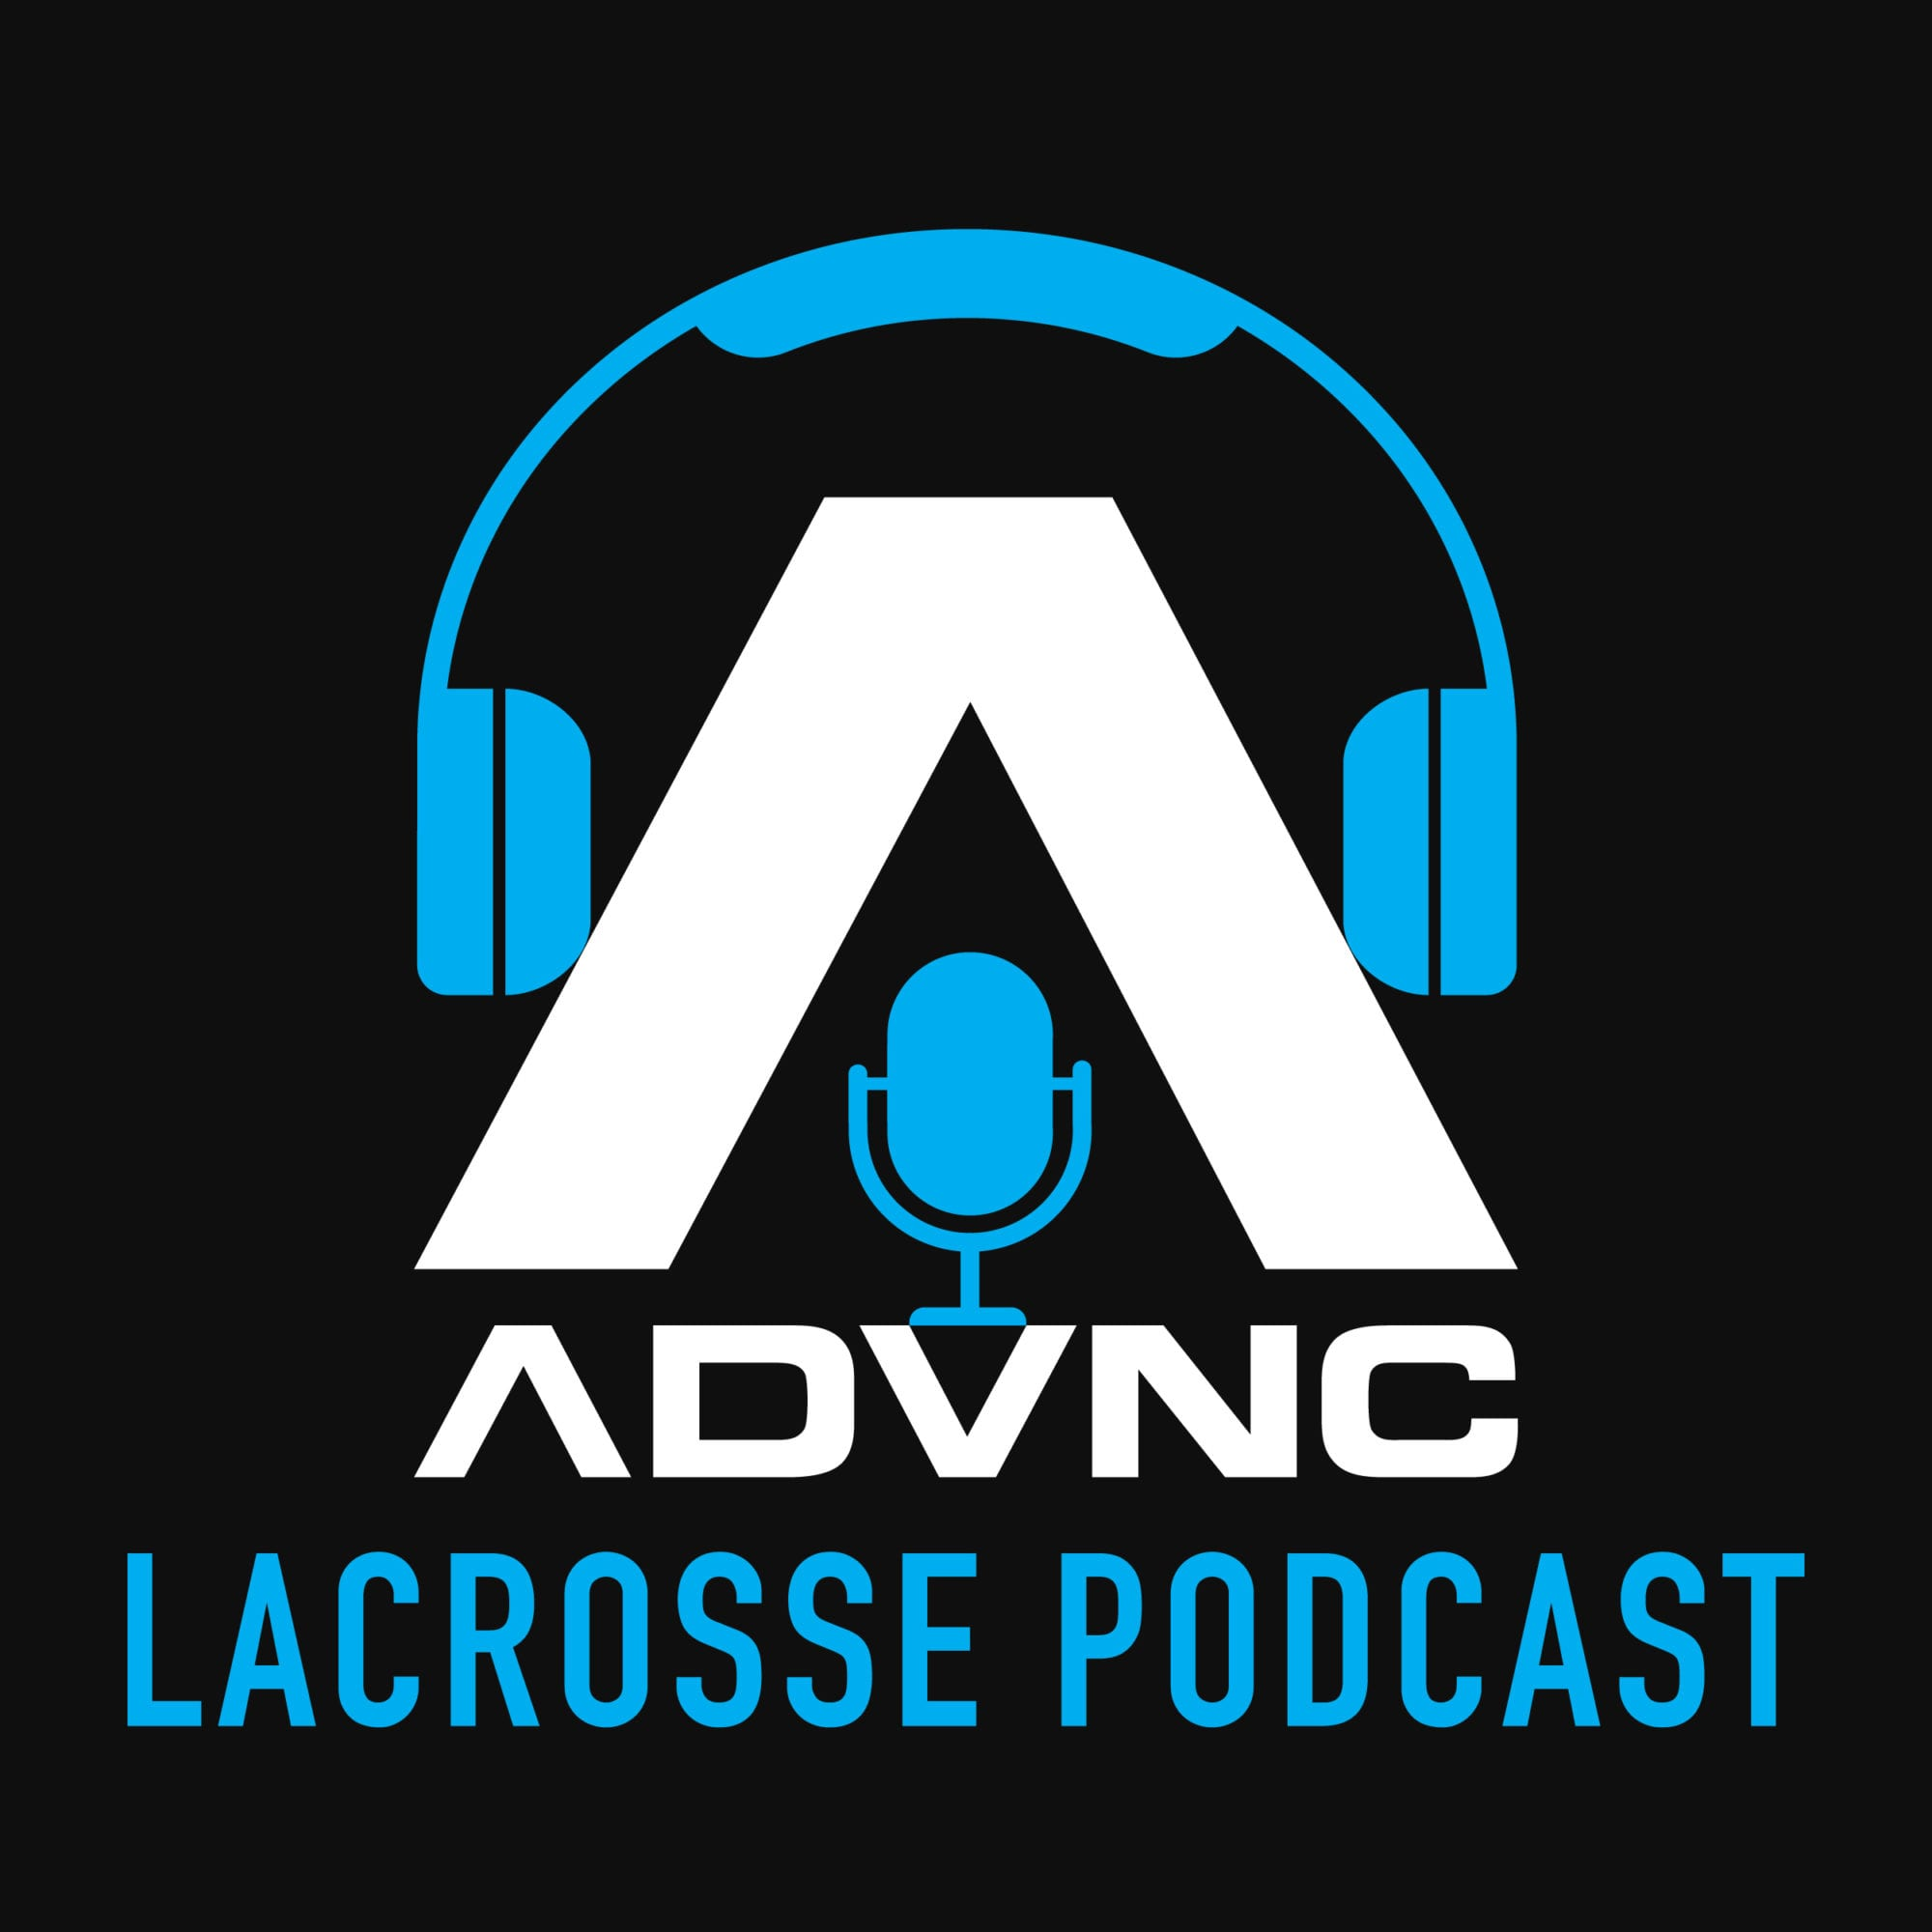 advnc lacrosse podcast steve stenersen Marcus Holman adam ghitelman ryan powell pat spencer jon torpey